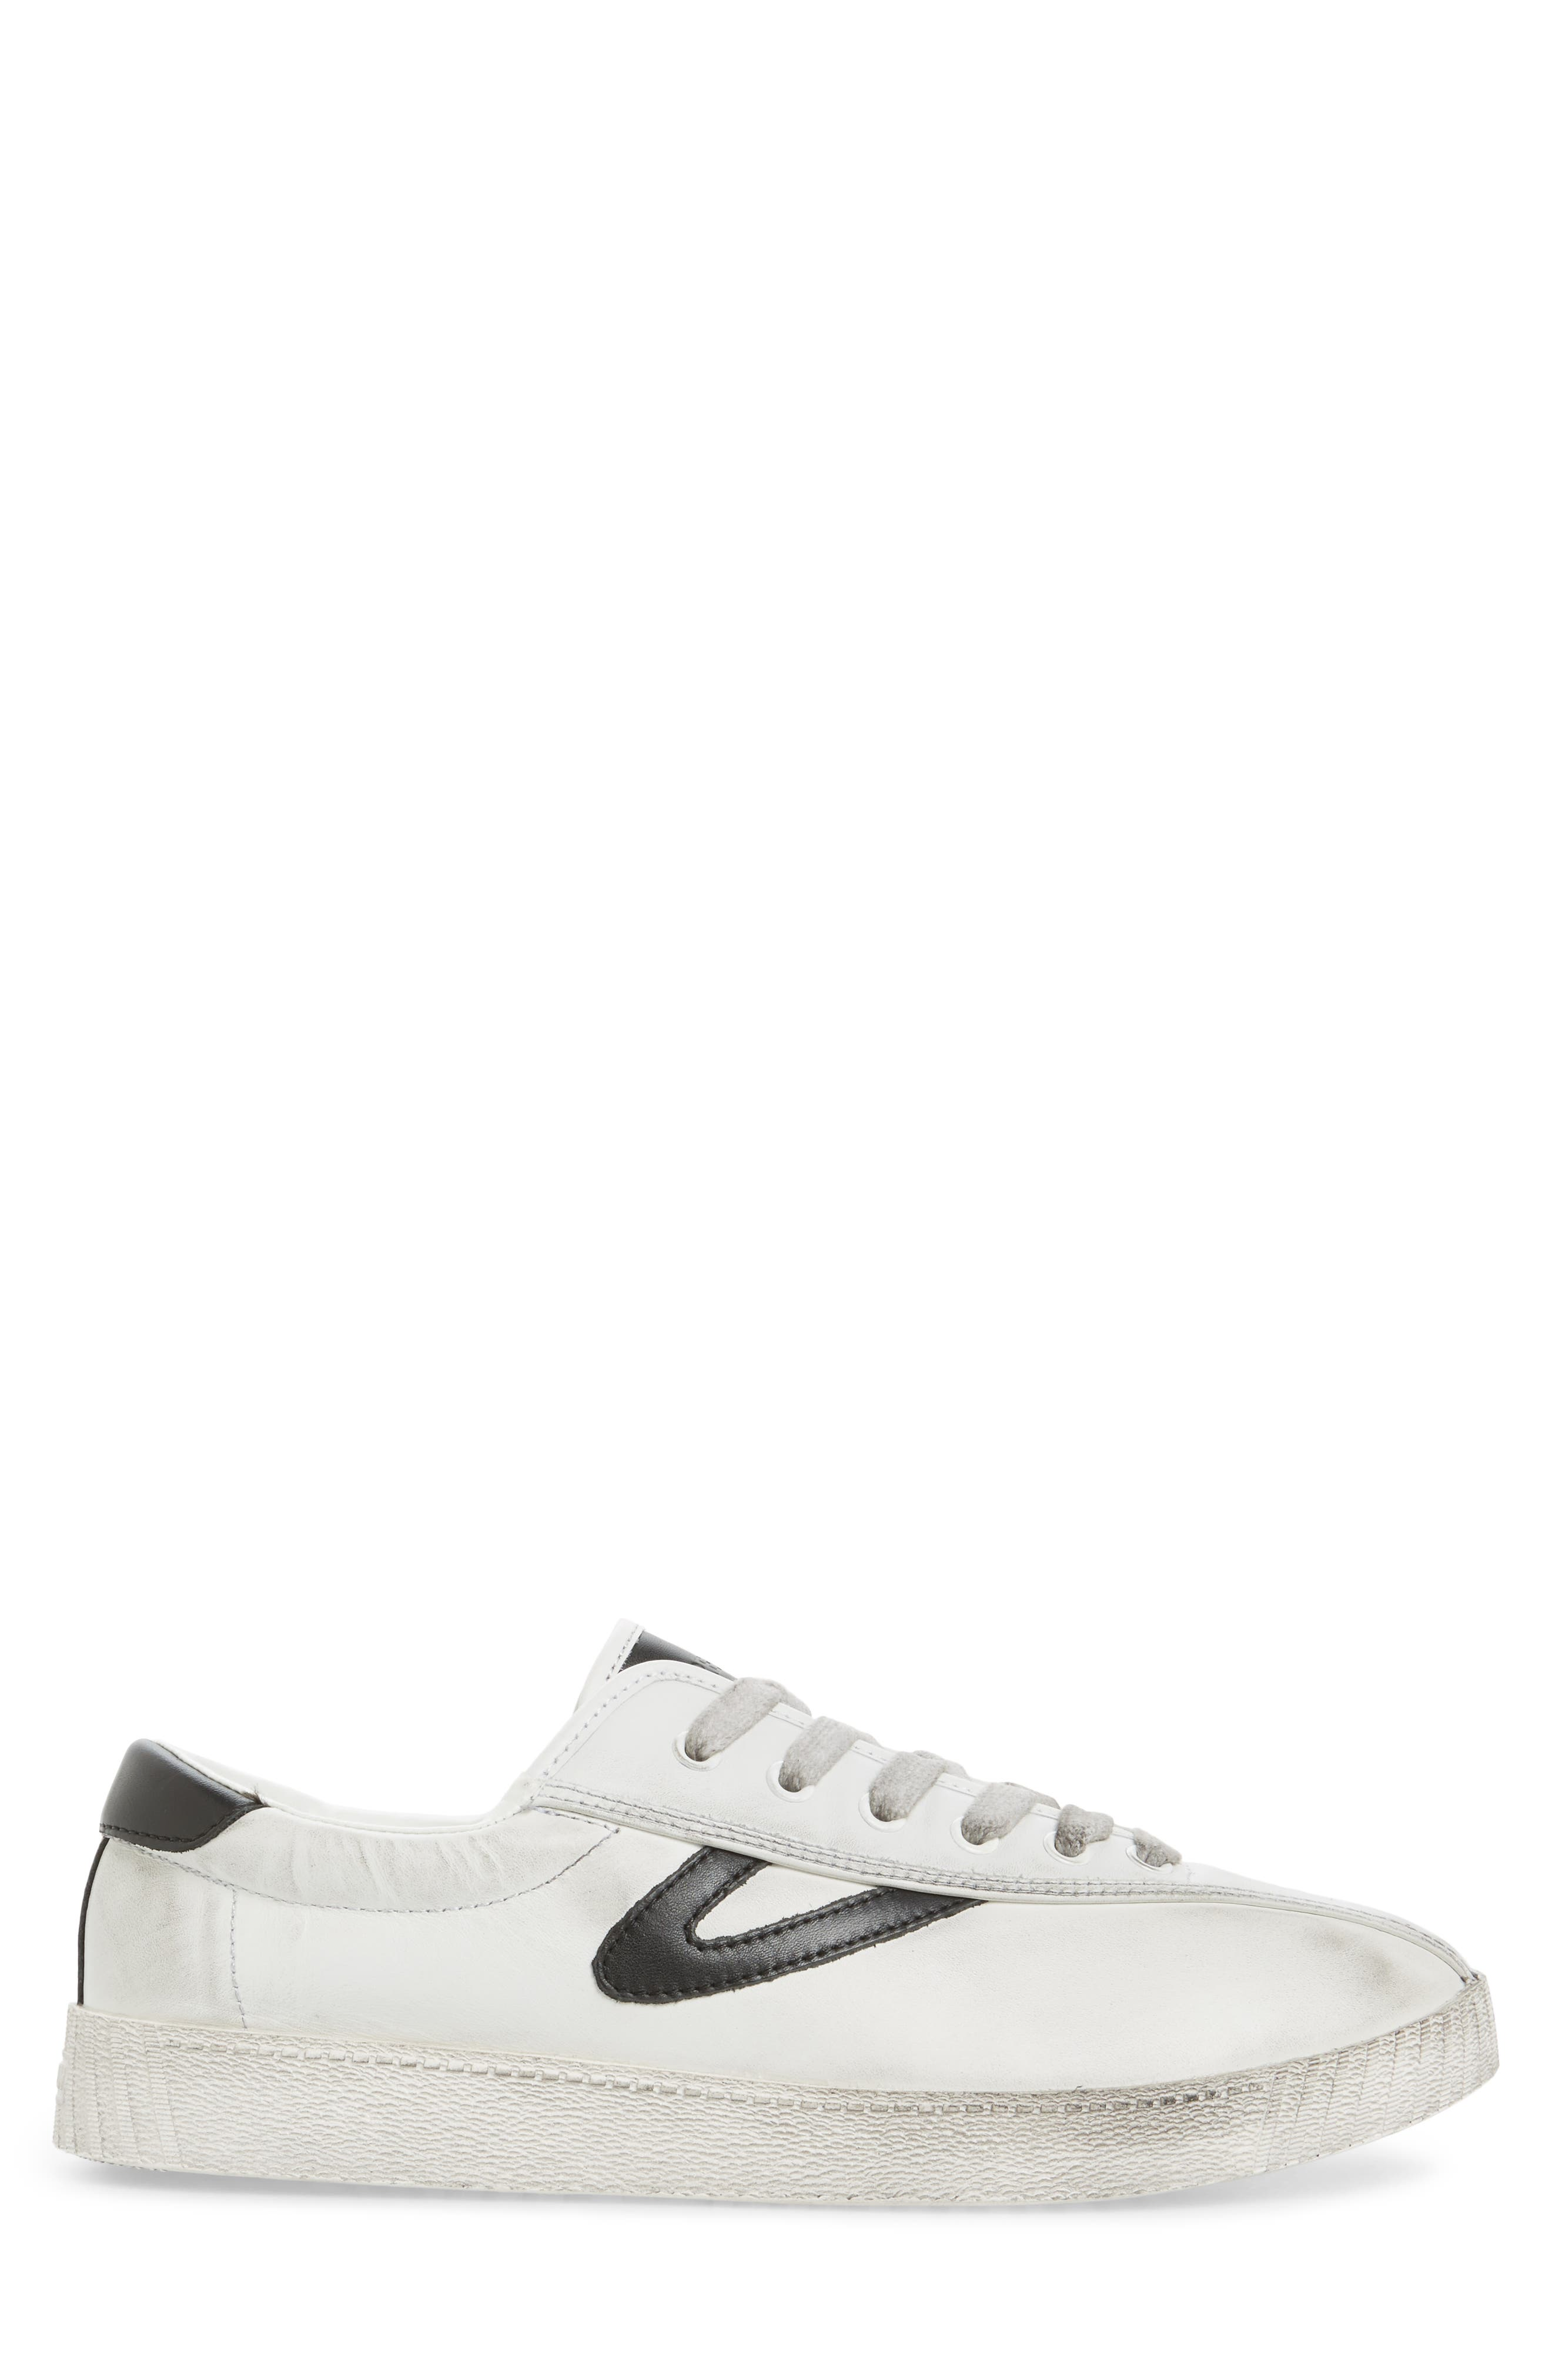 Nylite 1891 Sneaker,                             Alternate thumbnail 3, color,                             154